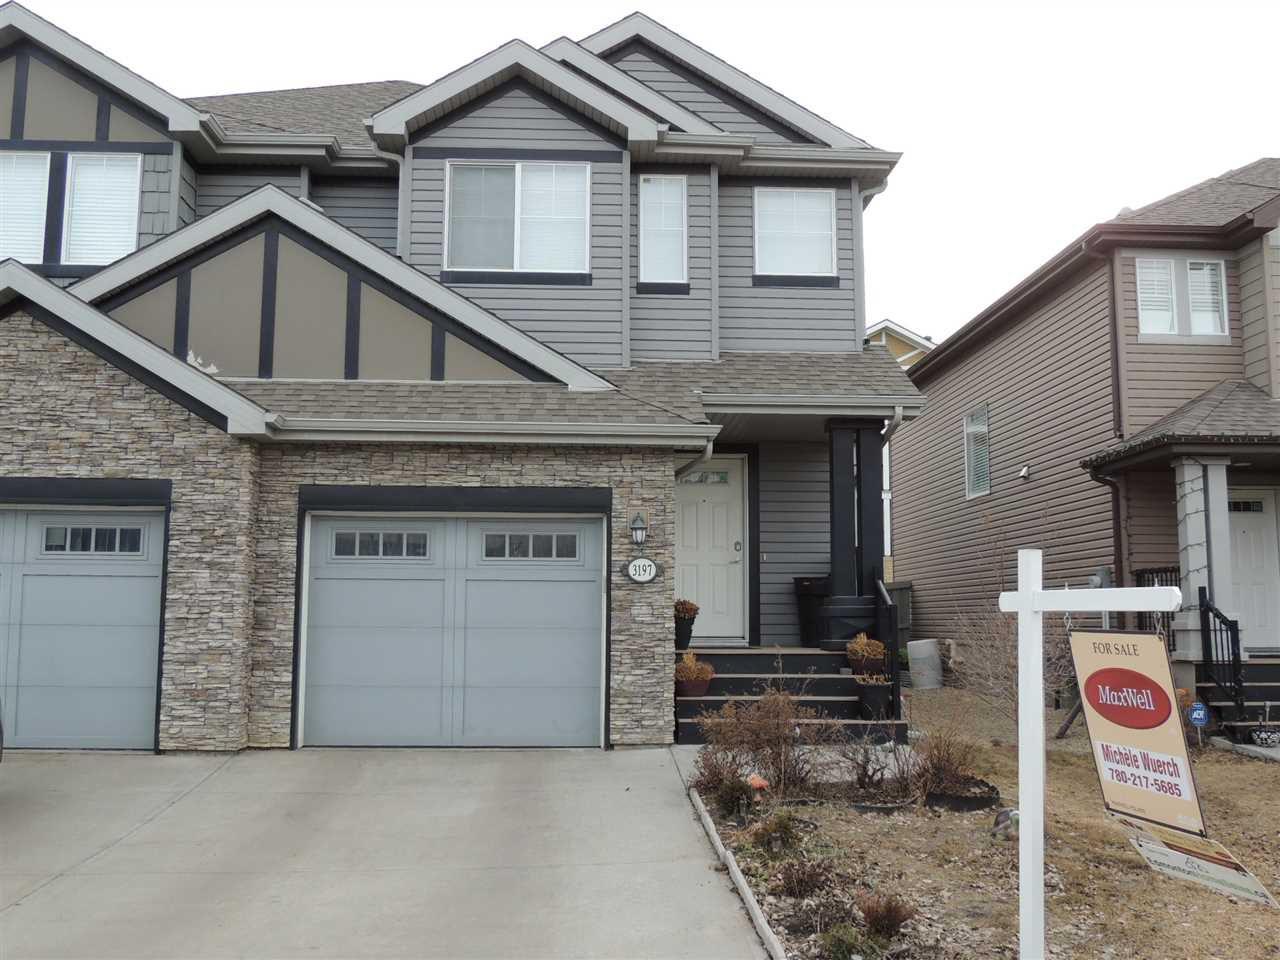 Main Photo: 3197 WHITELAW Drive in Edmonton: Zone 56 House Half Duplex for sale : MLS®# E4145136